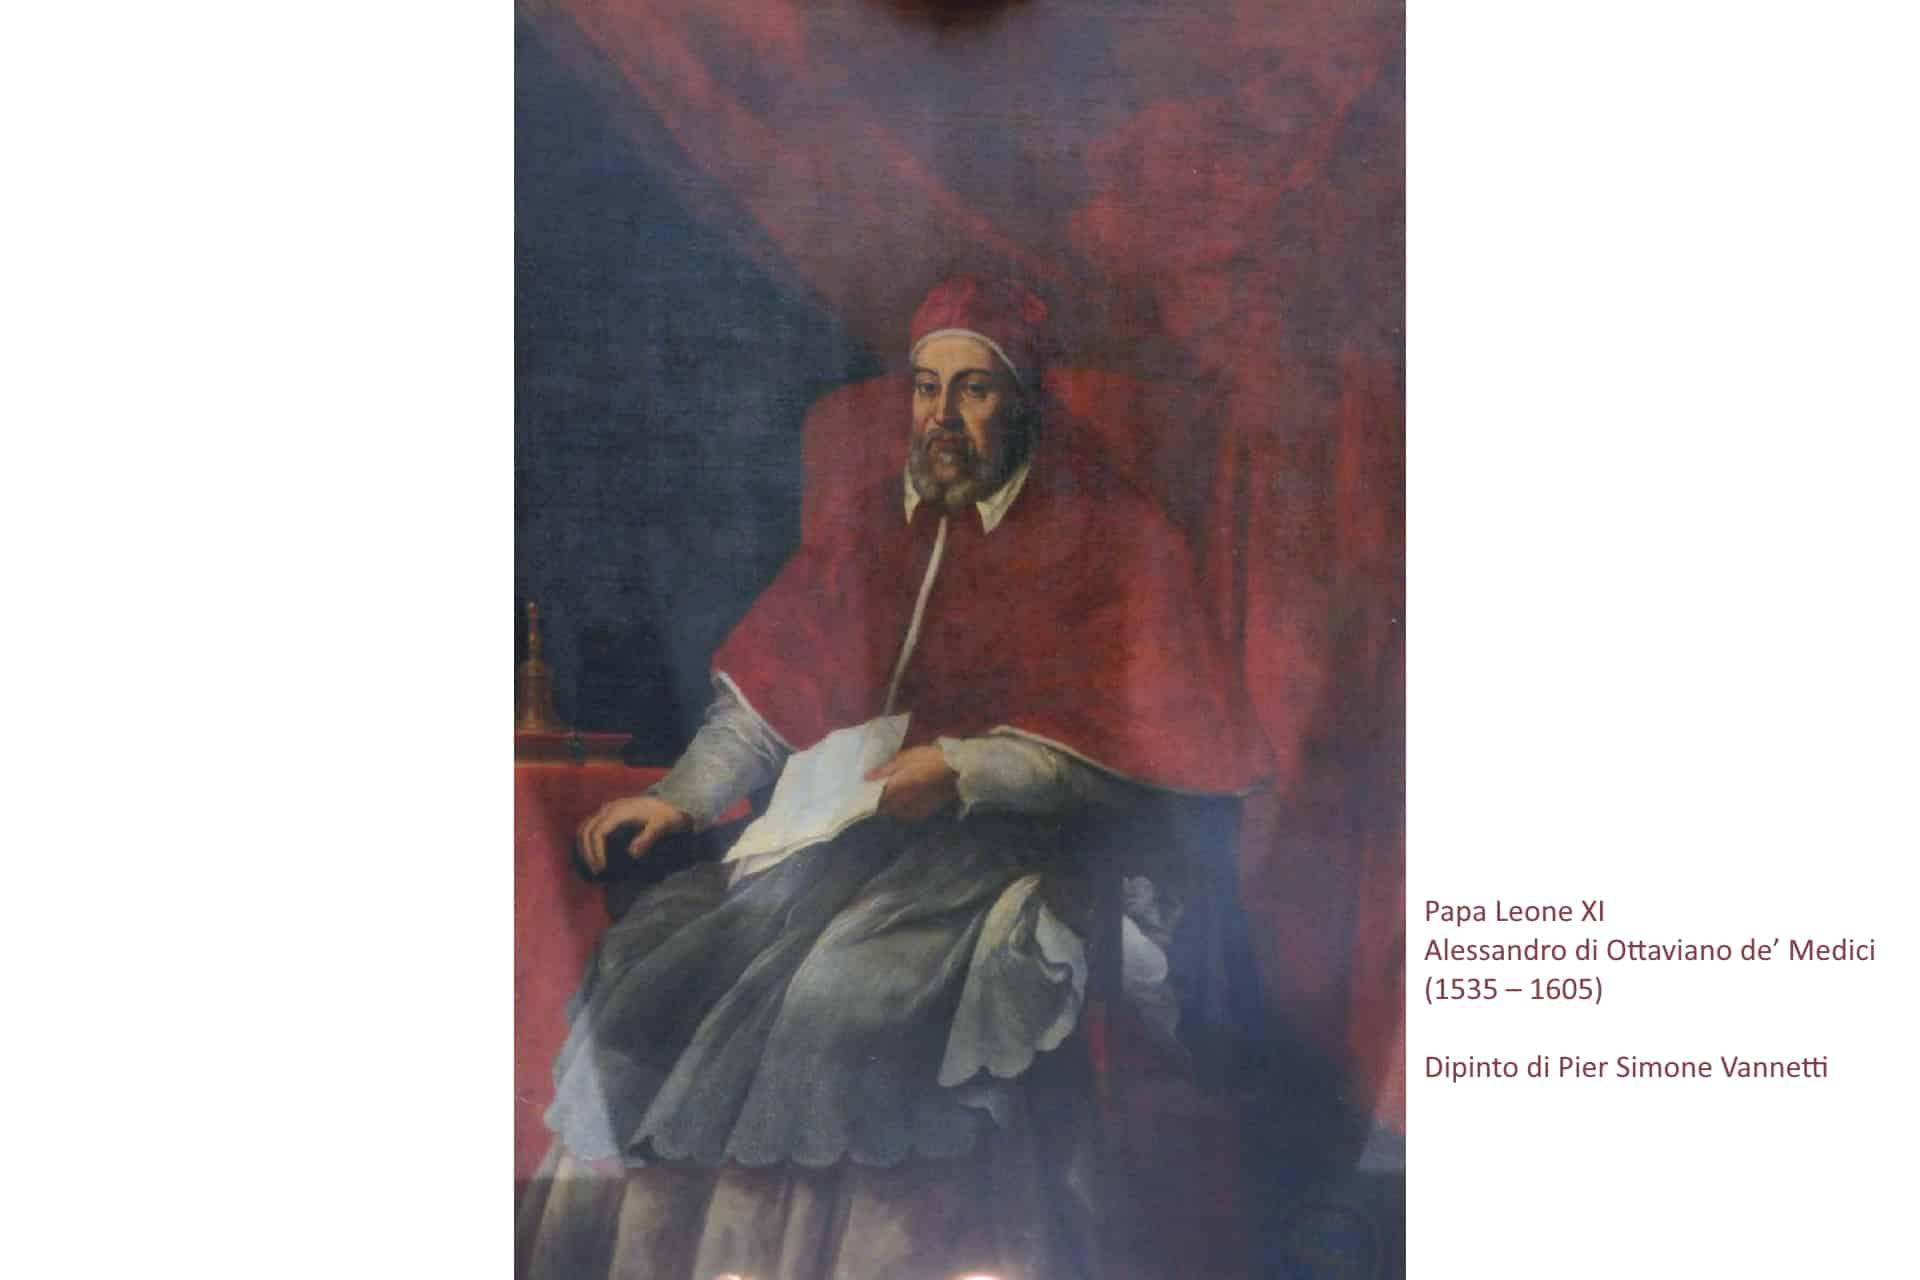 Papa Leone XI